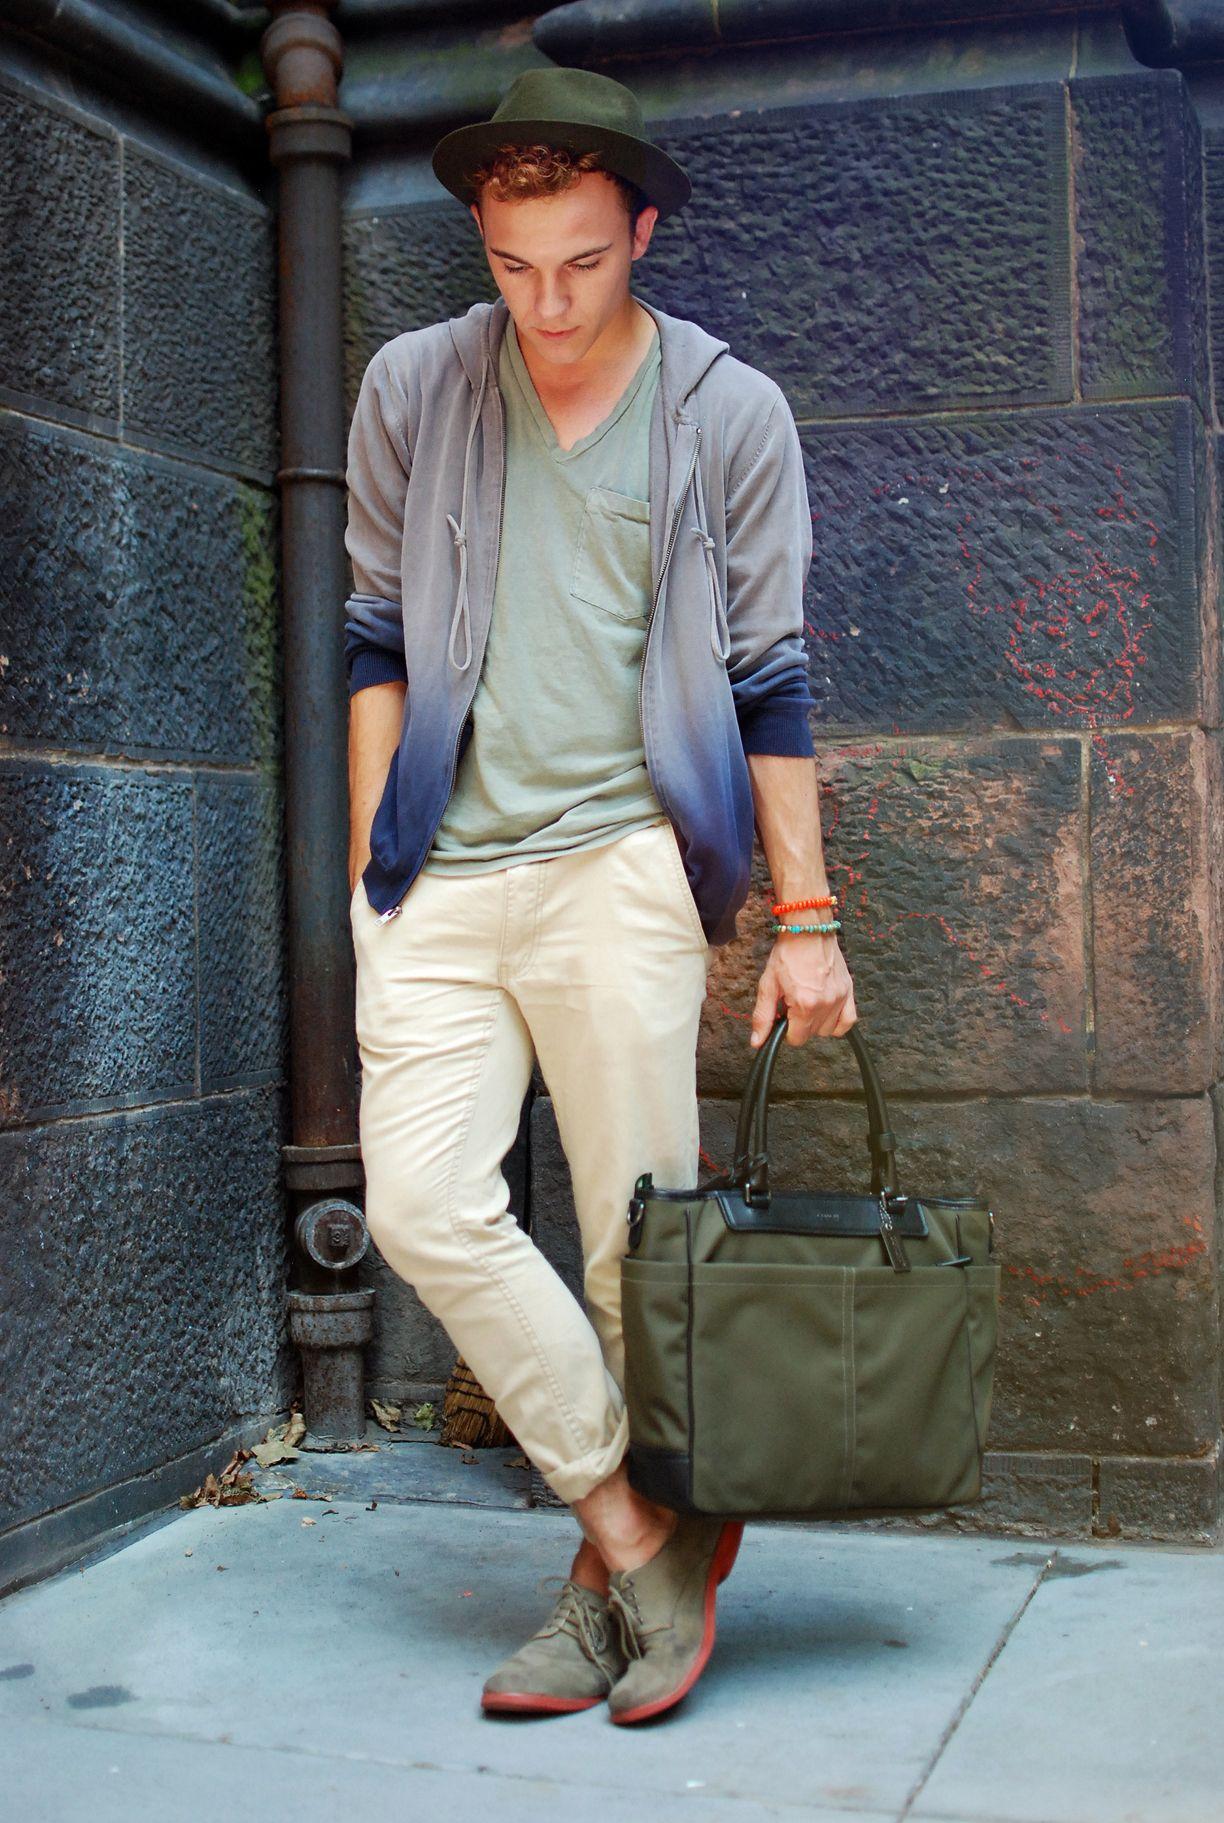 Ravelry: Better Dorm Boots Slippers by Kris Basta